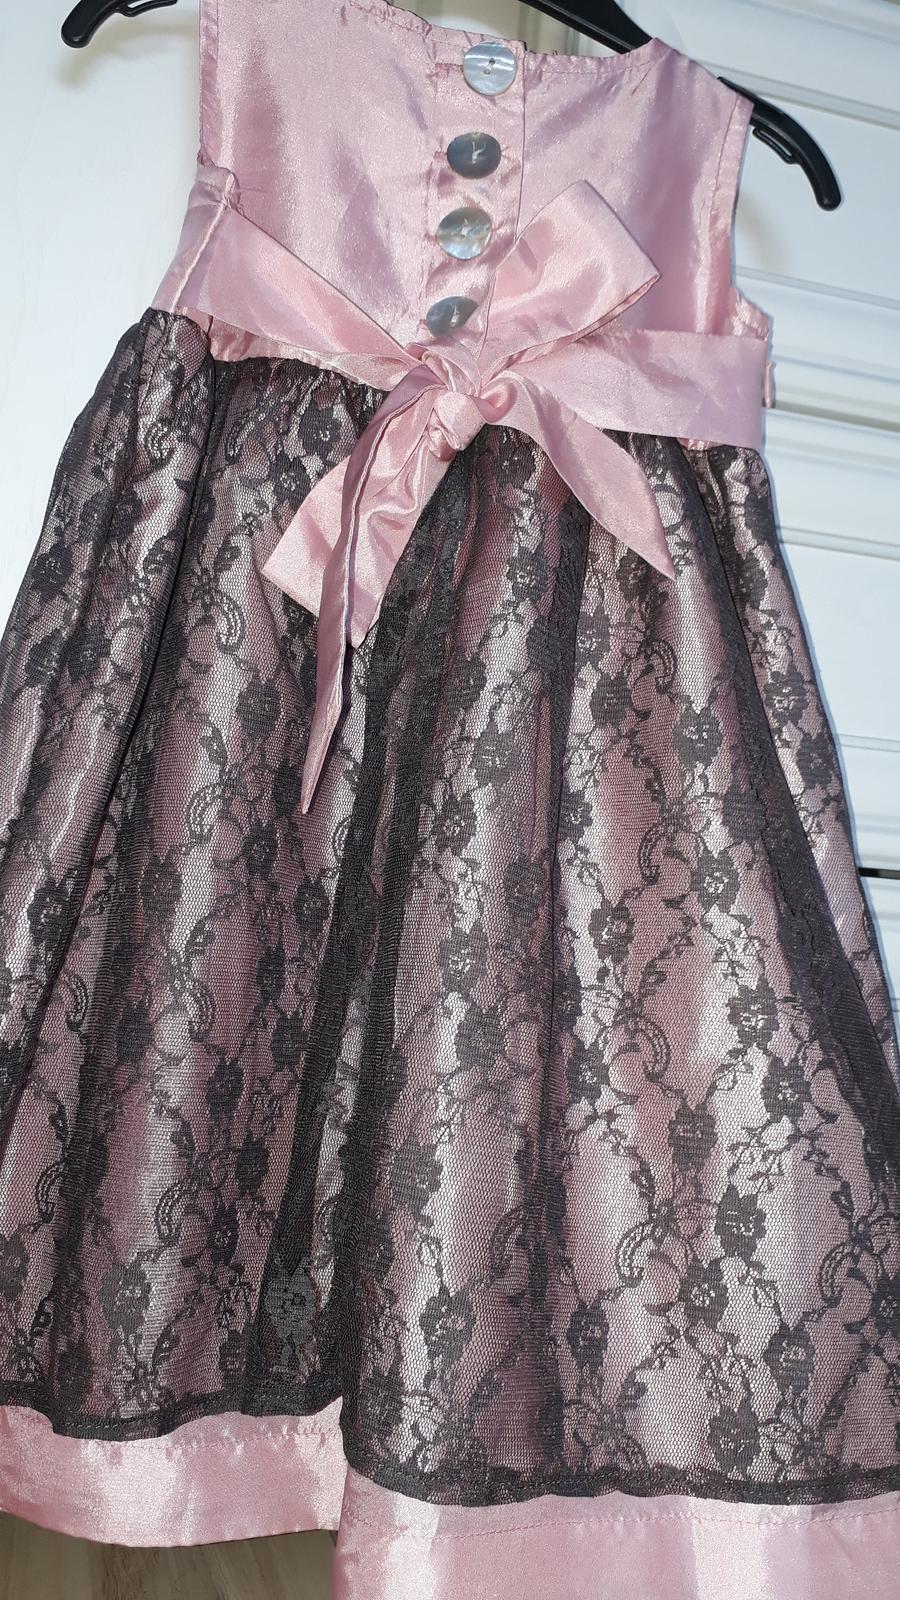 Luxusné šaty s krajkou - Obrázok č. 2